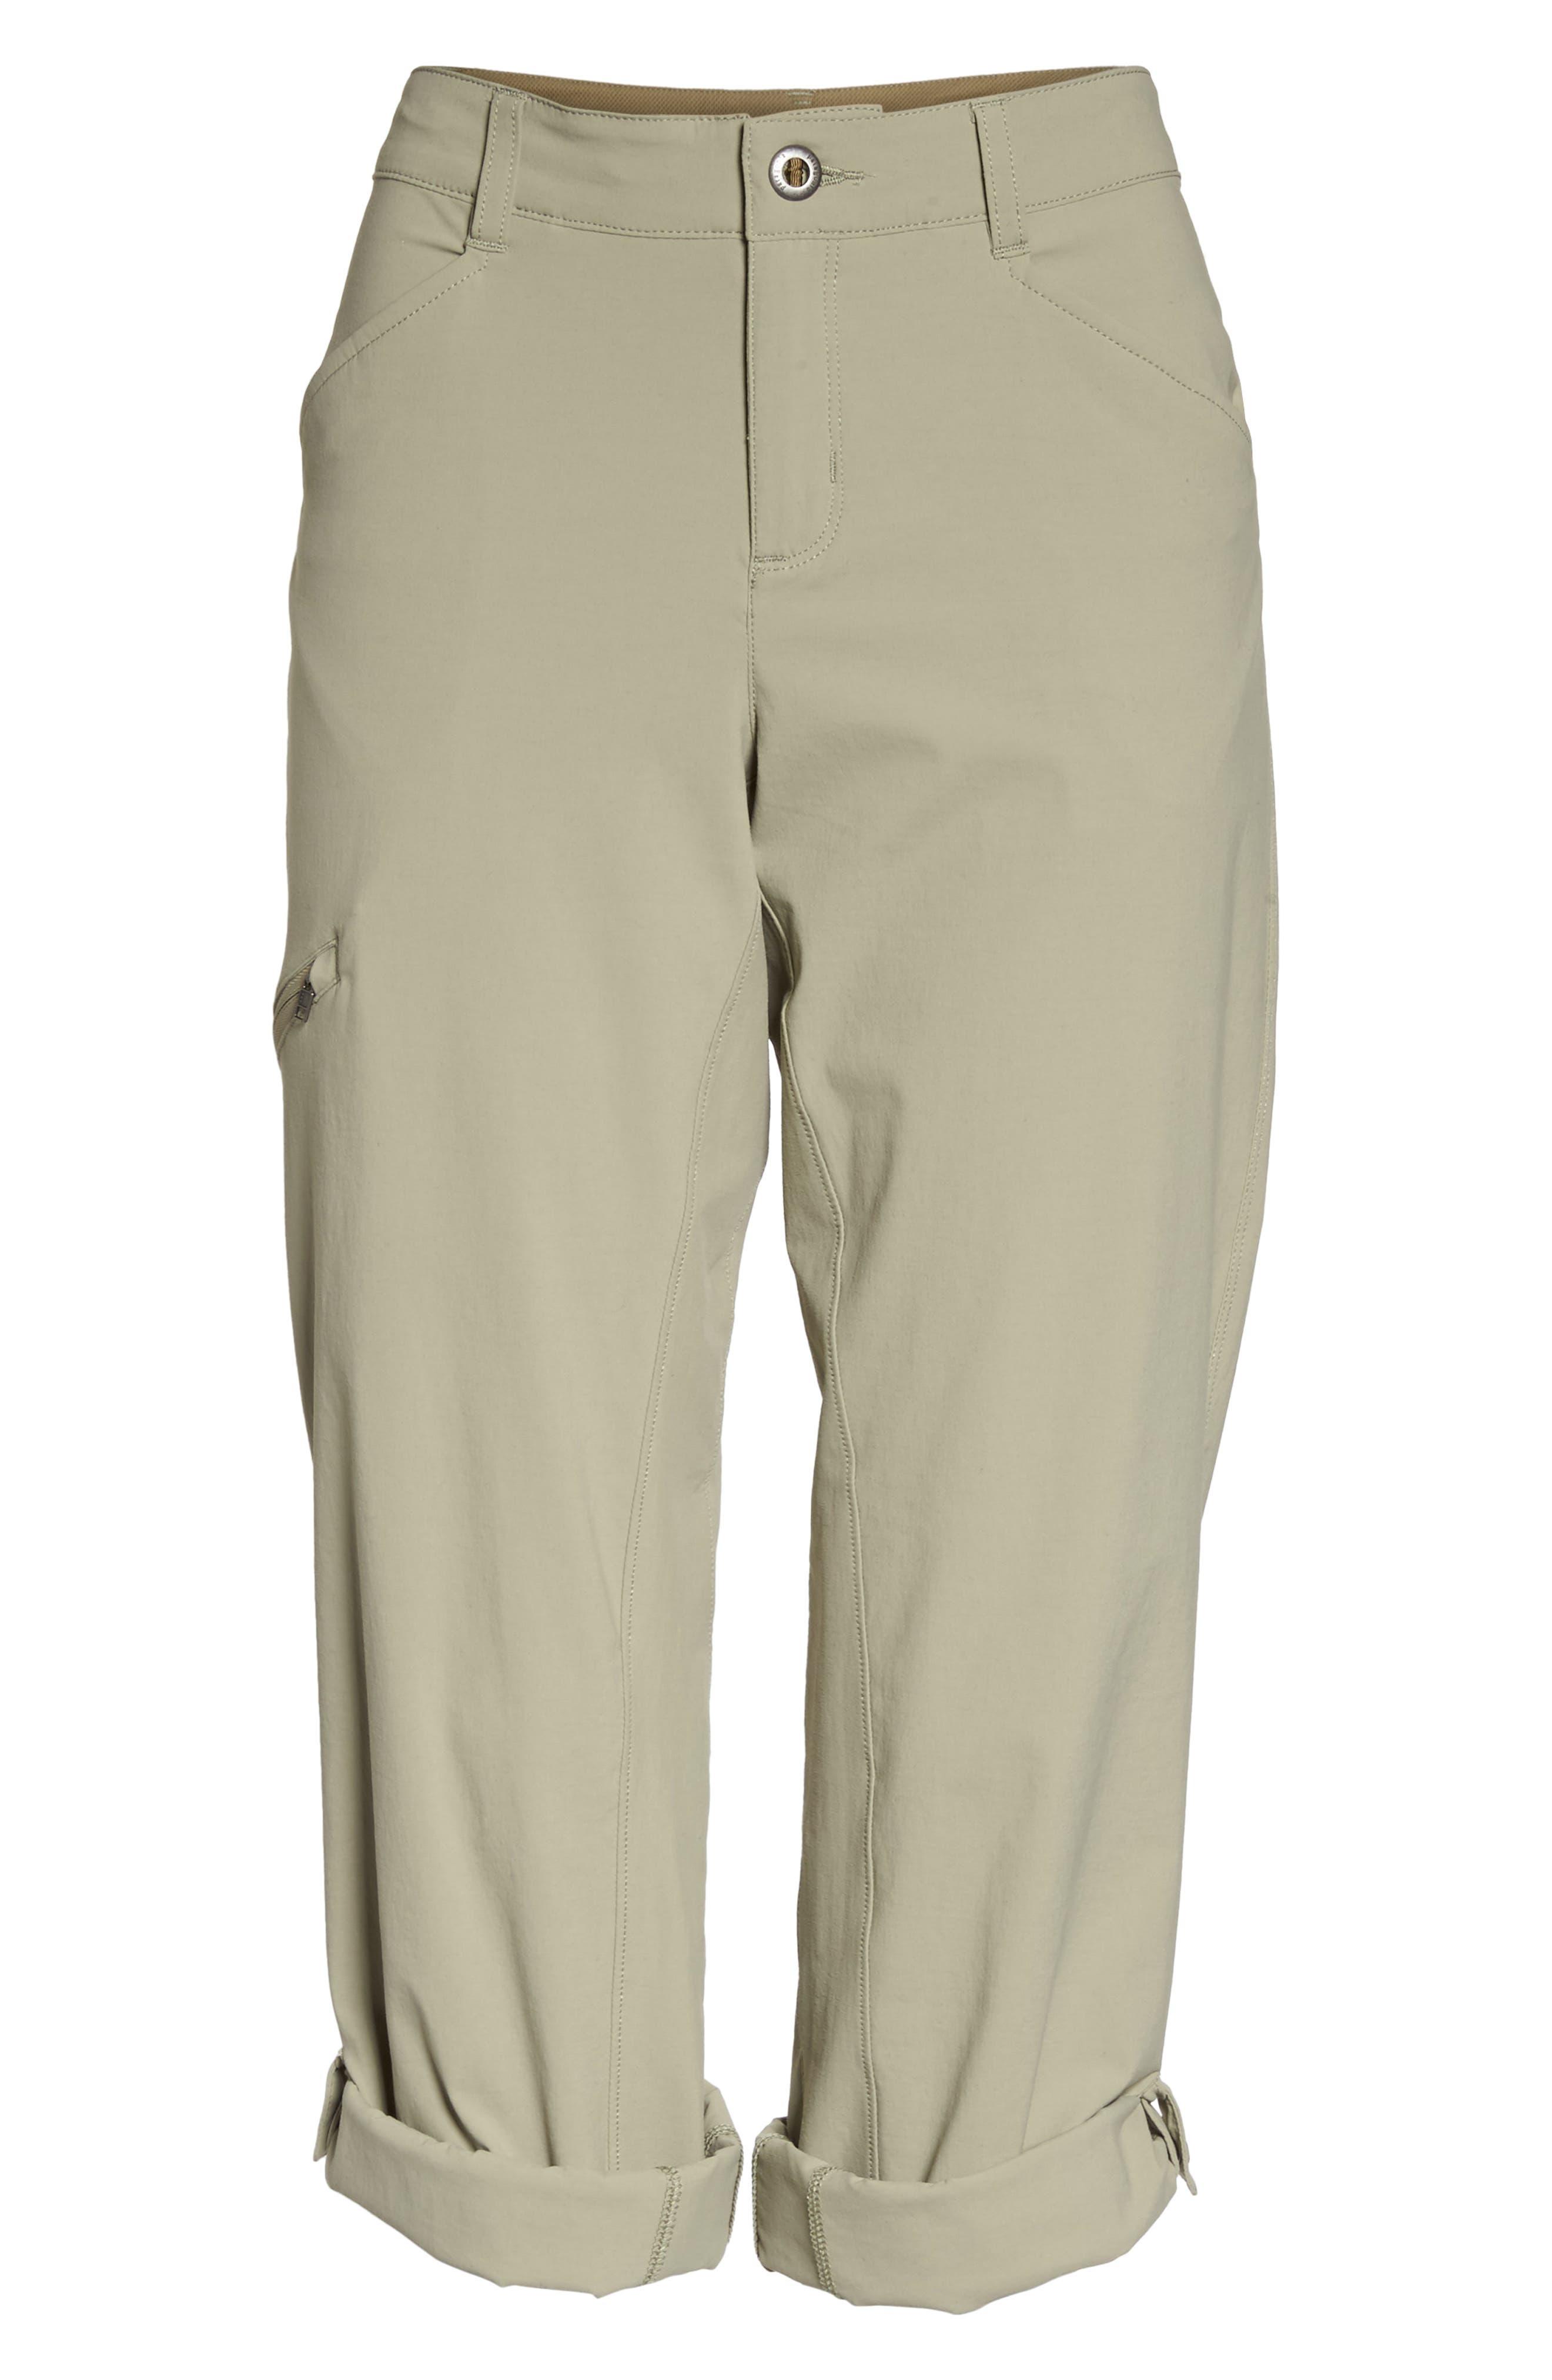 Quandary Pants,                             Alternate thumbnail 7, color,                             SHLE SHALE